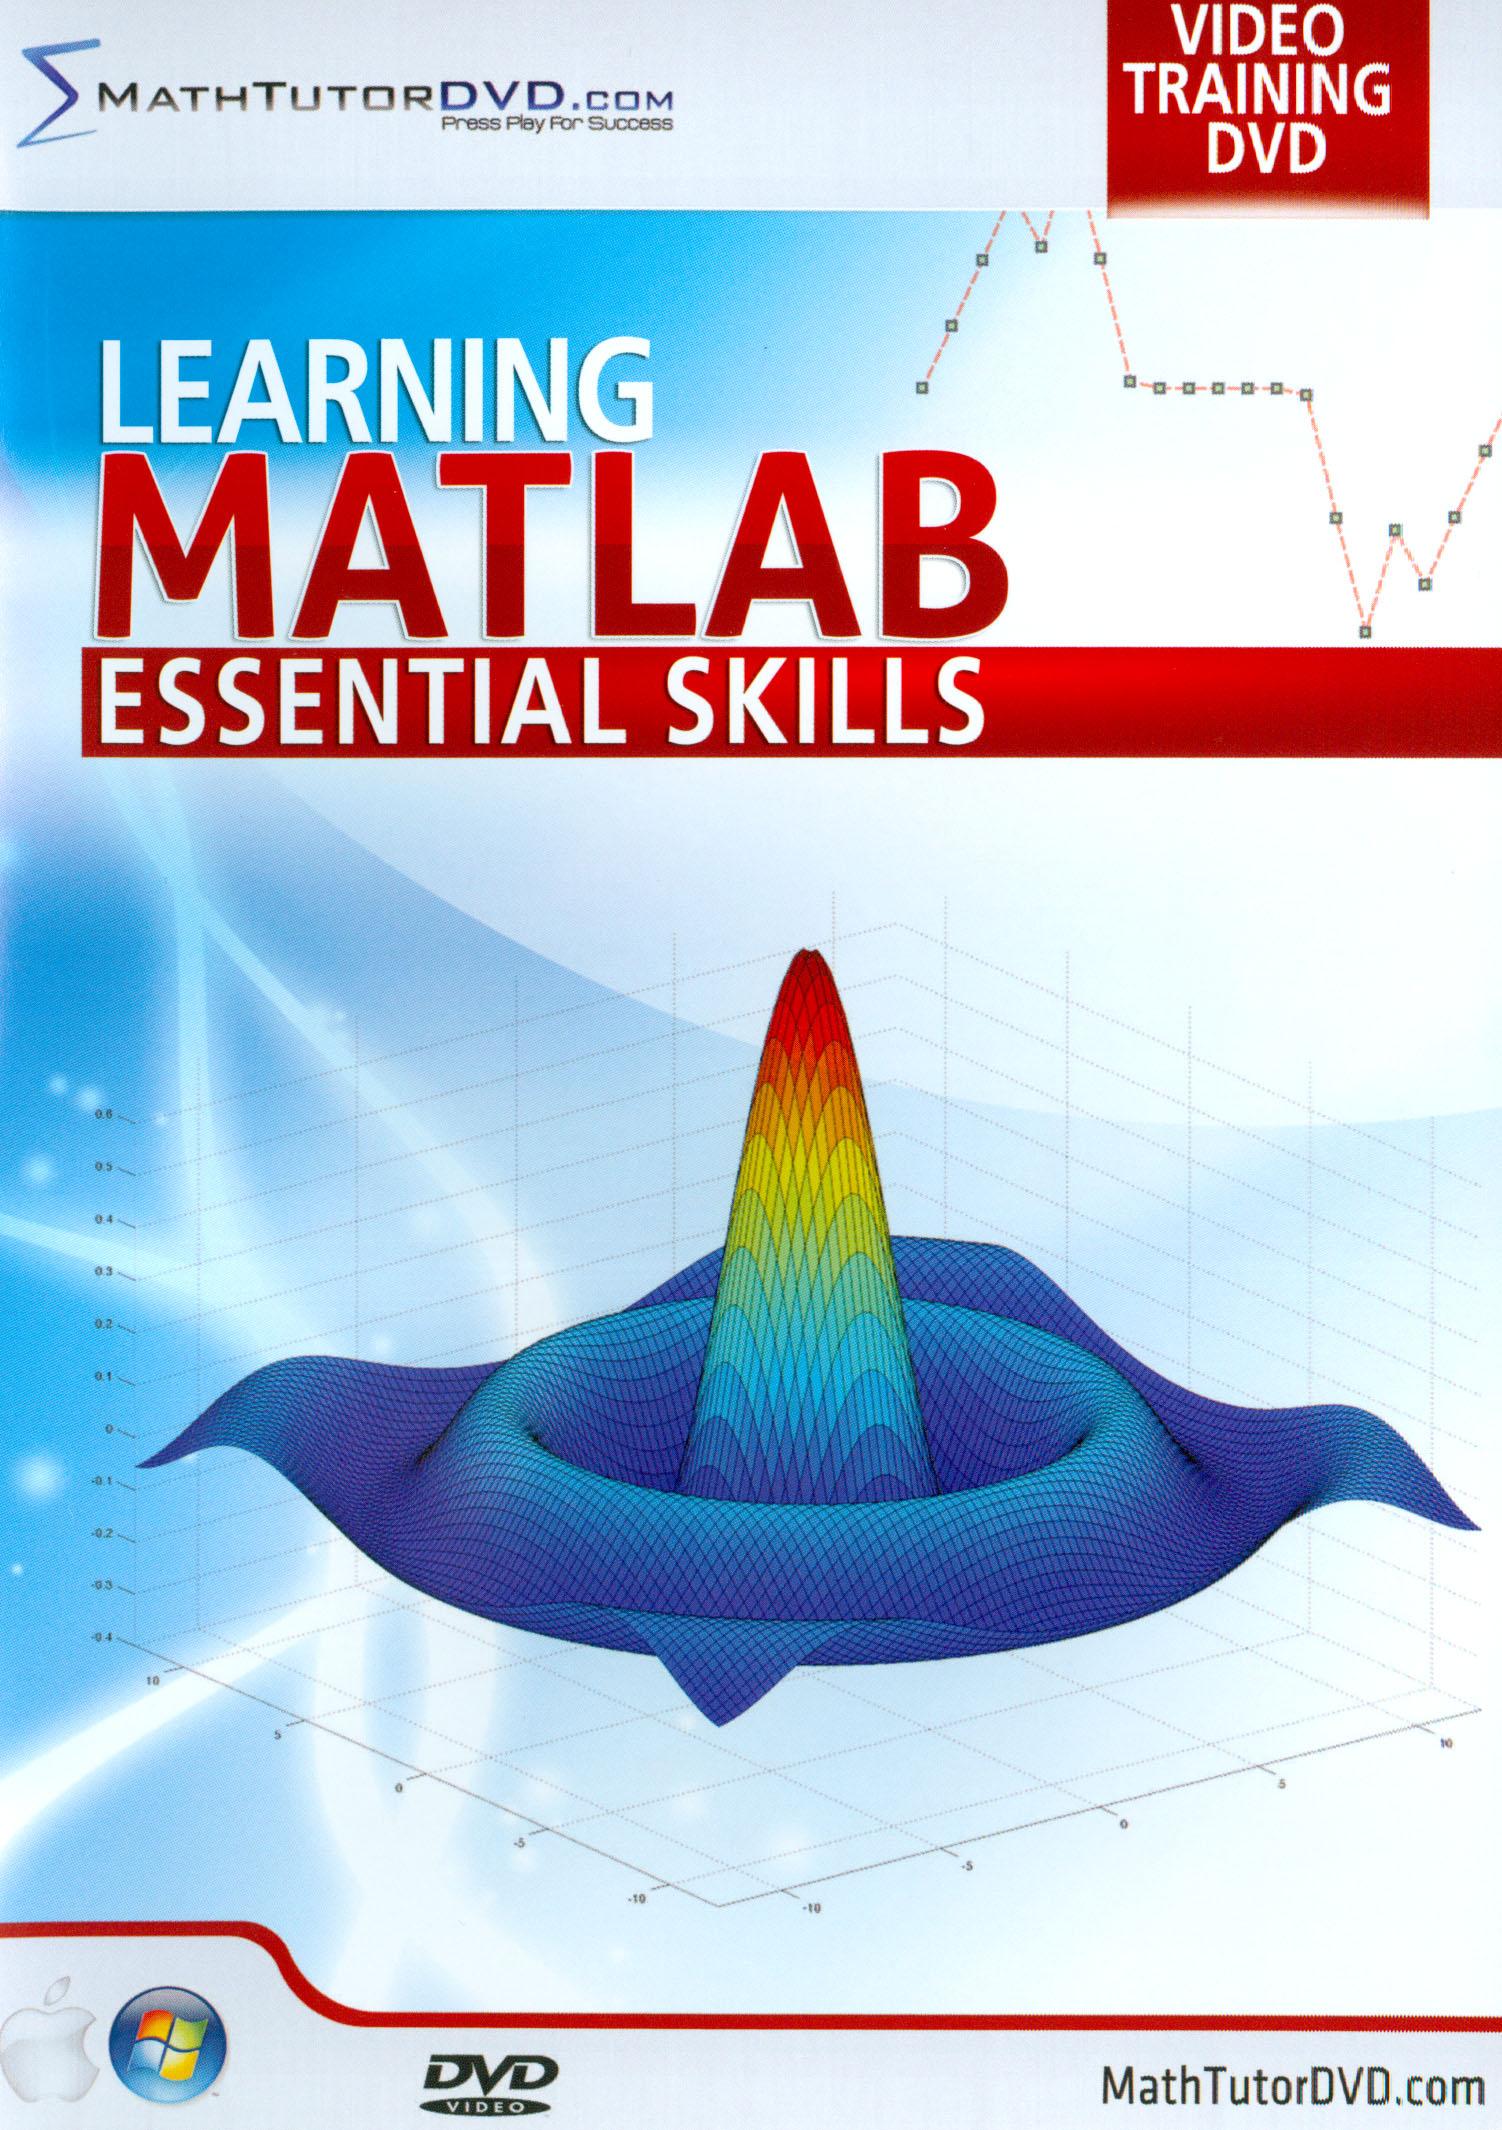 Learning Matlab Essential Skills